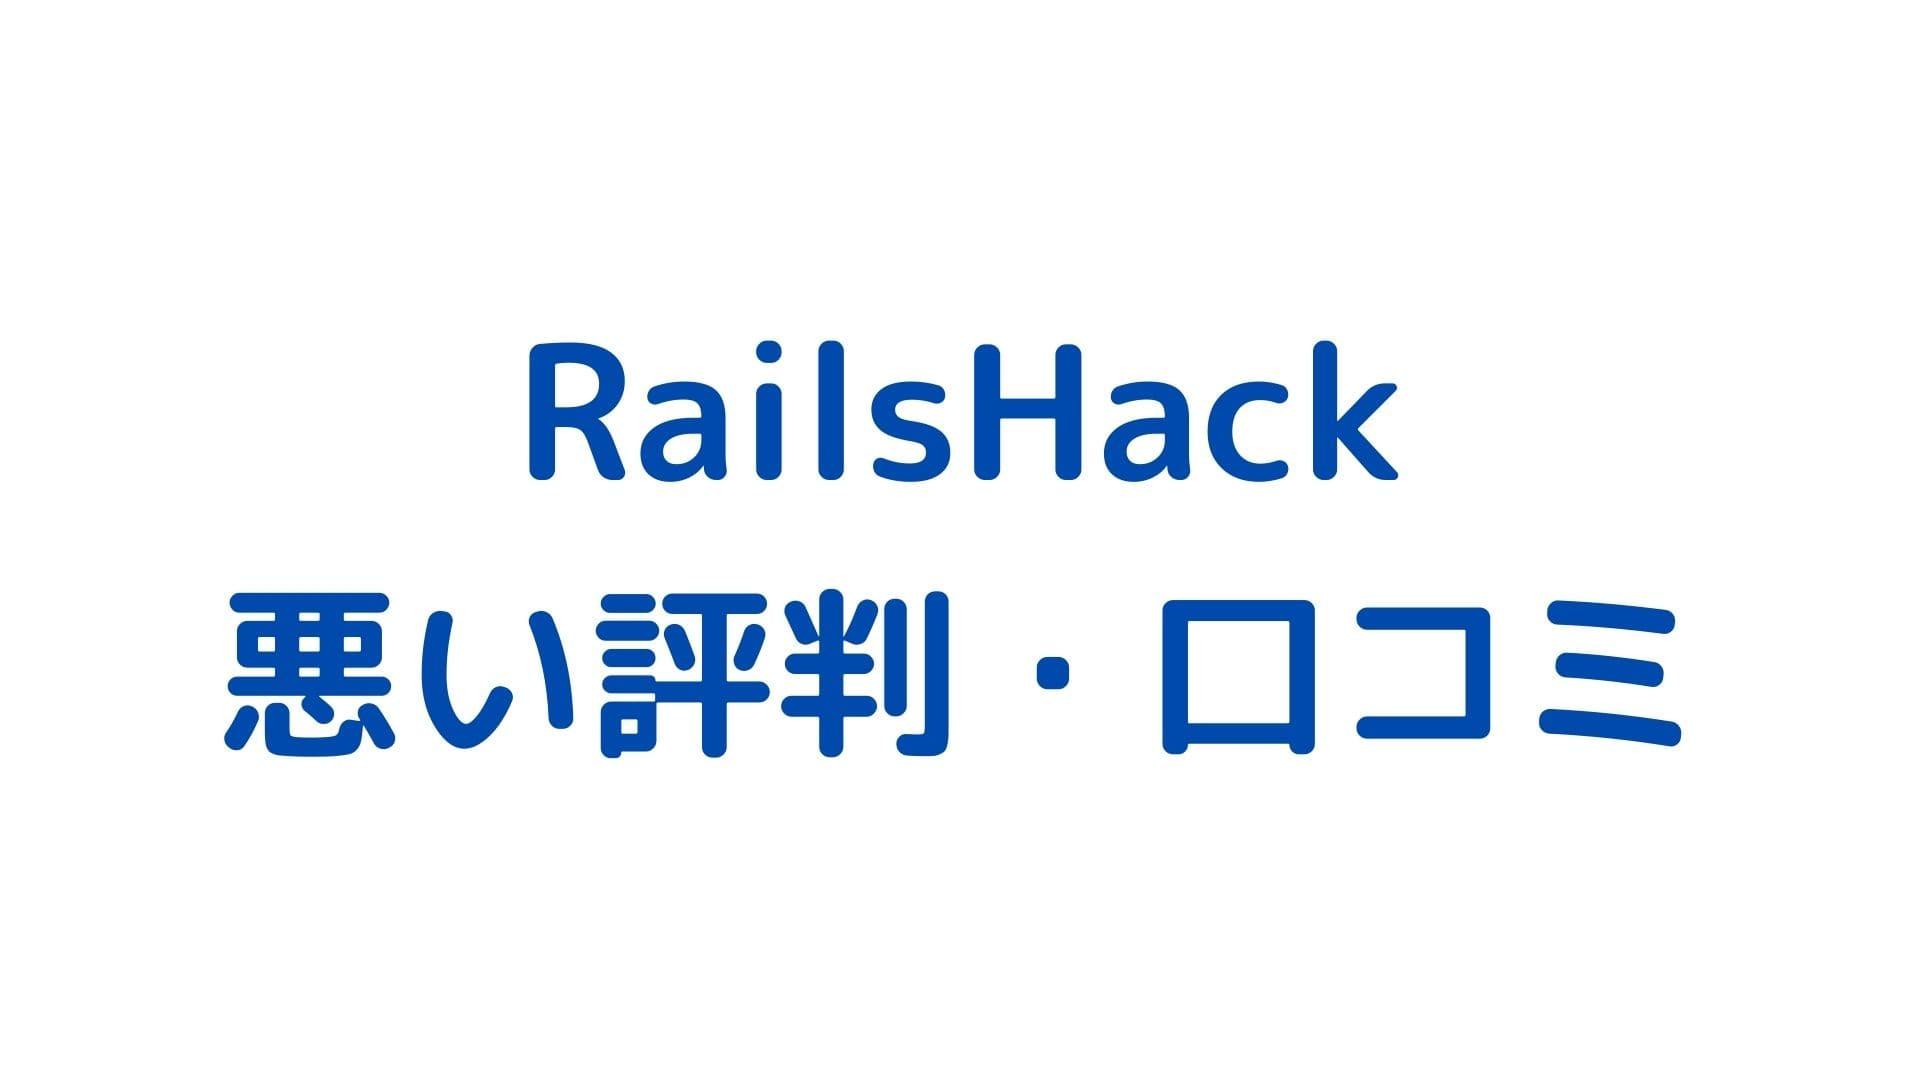 RailsHack(レイルズハック)